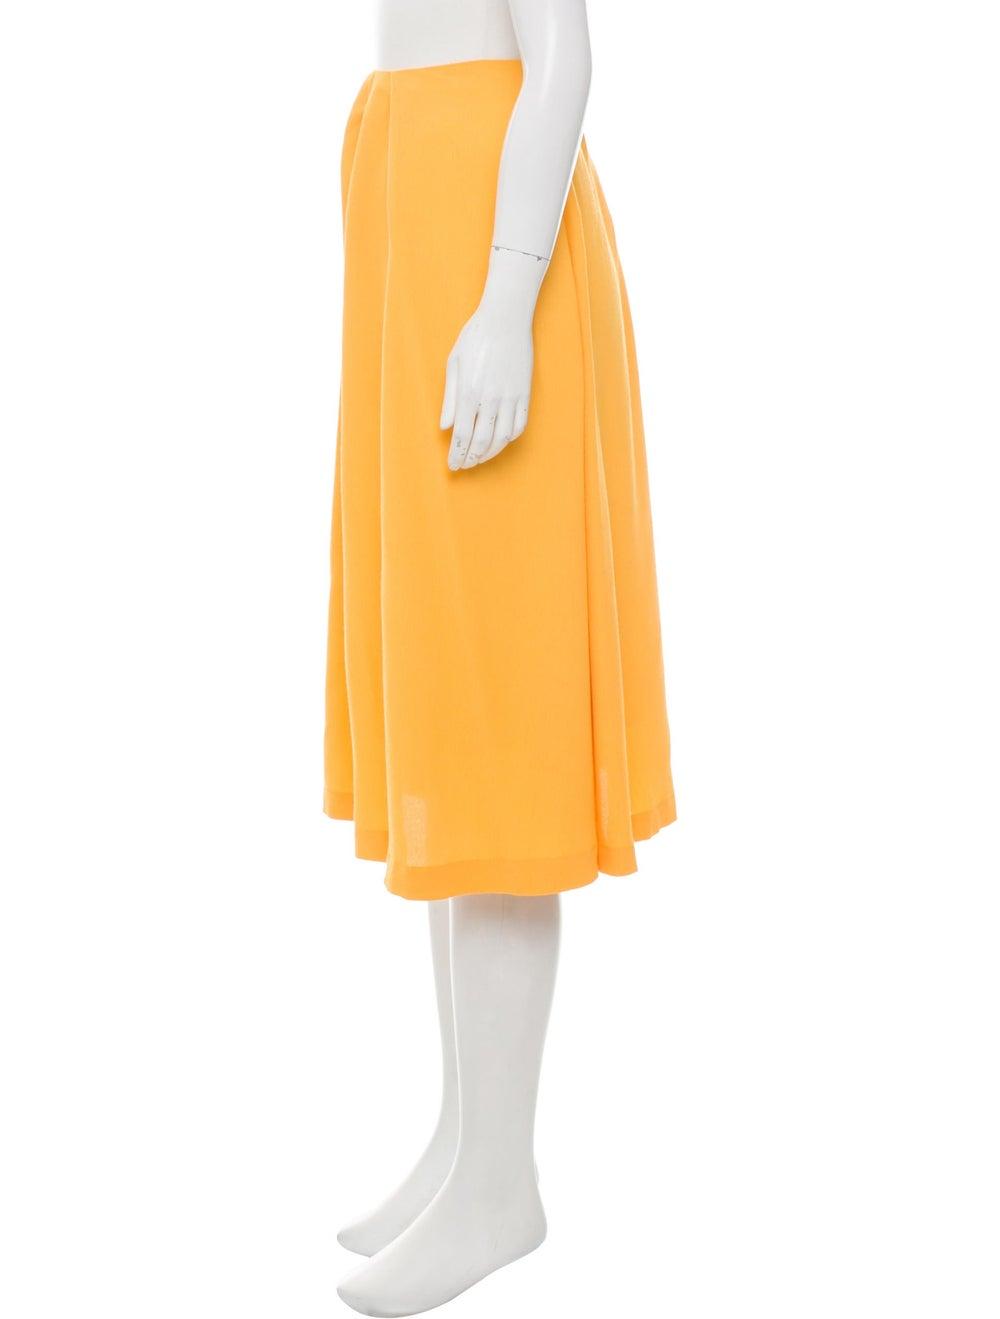 Marimekko Pleated Knee-Length Skirt Yellow - image 2